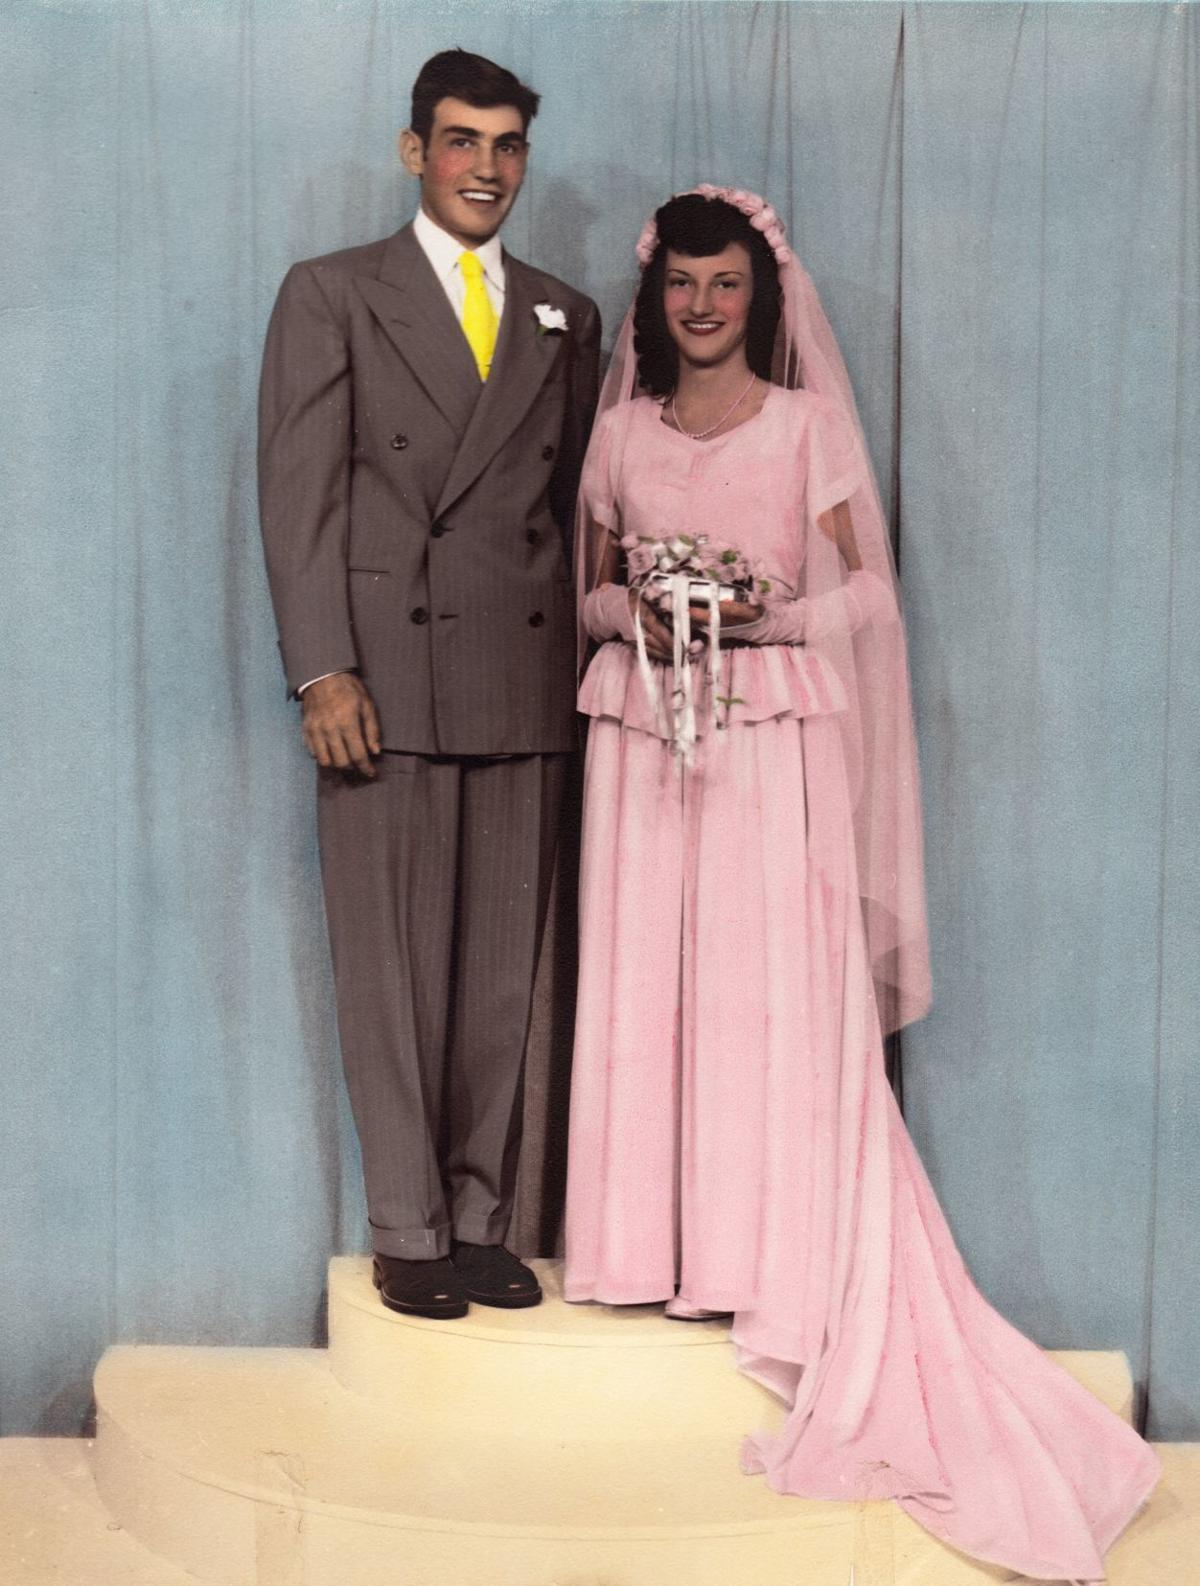 021319ho-old-wedding-photo